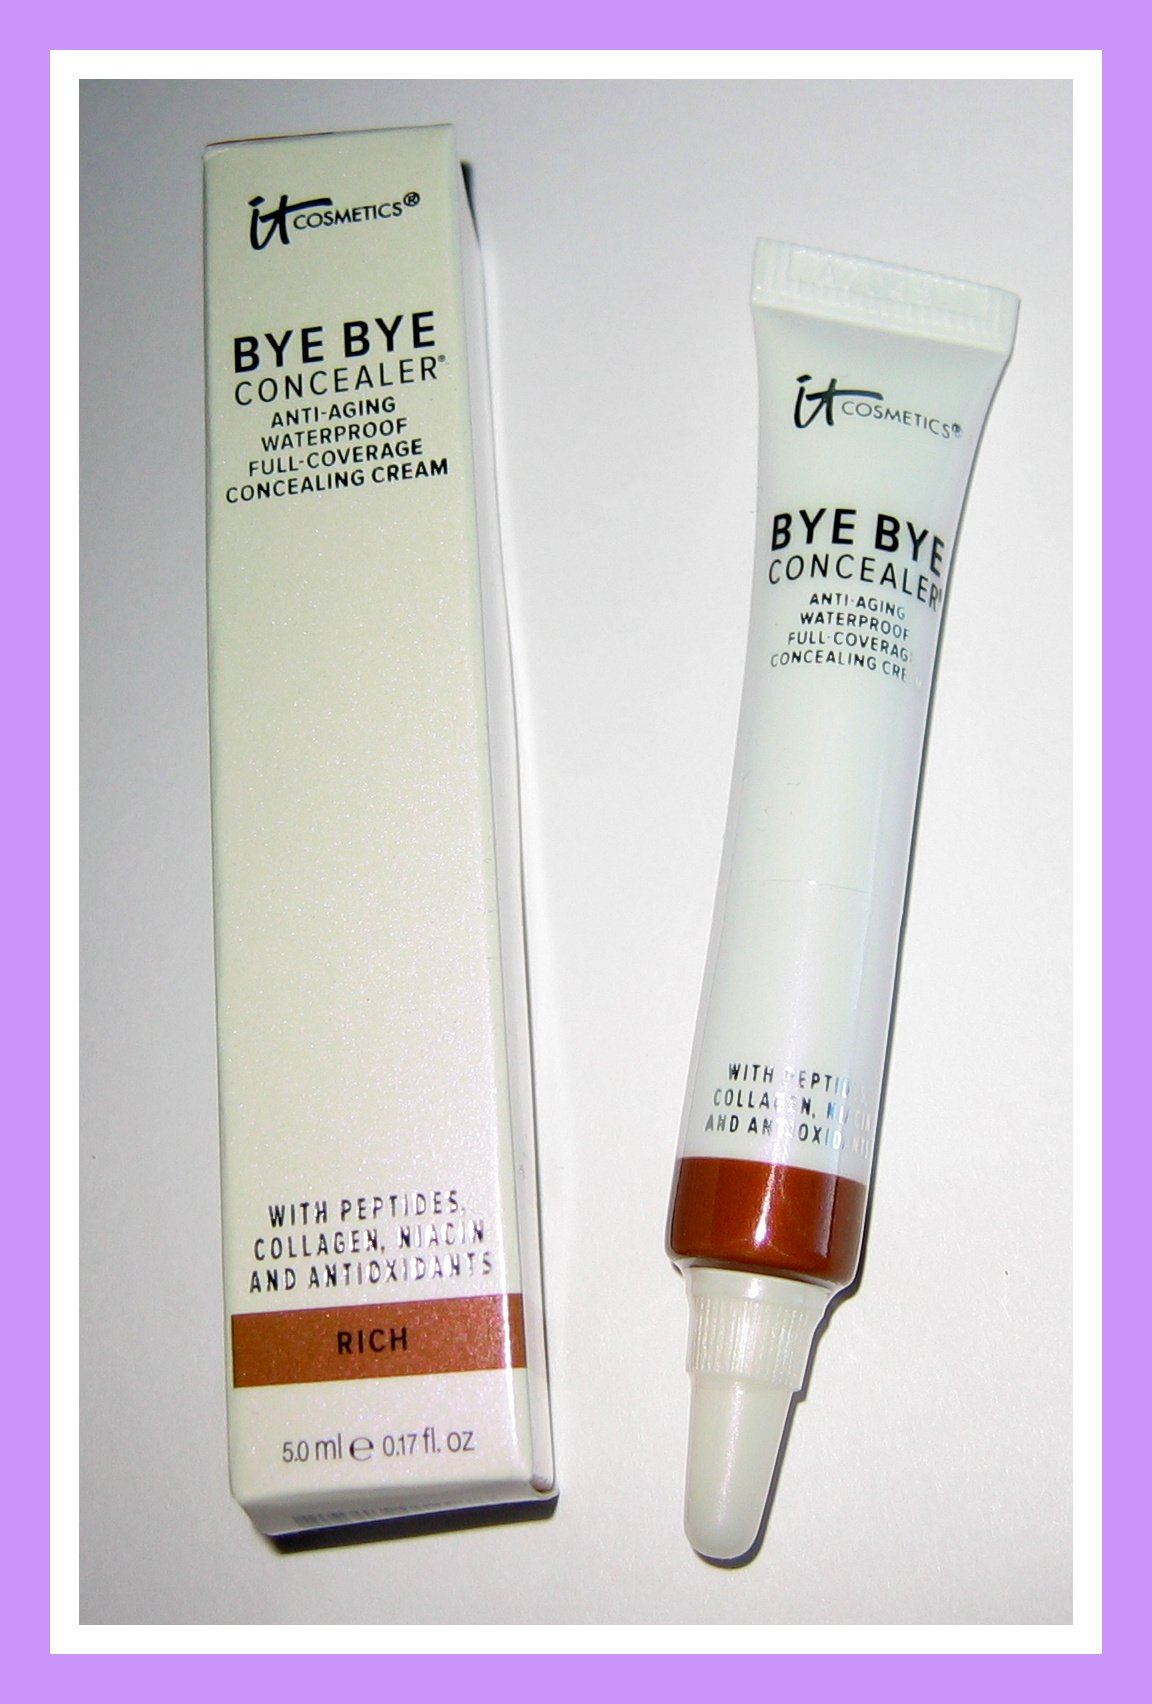 It Cosmetics RICH Bye Bye Anti-Aging Waterproof Full-Coverage Concealer - 5 mL / 0.17 fl oz - NIB